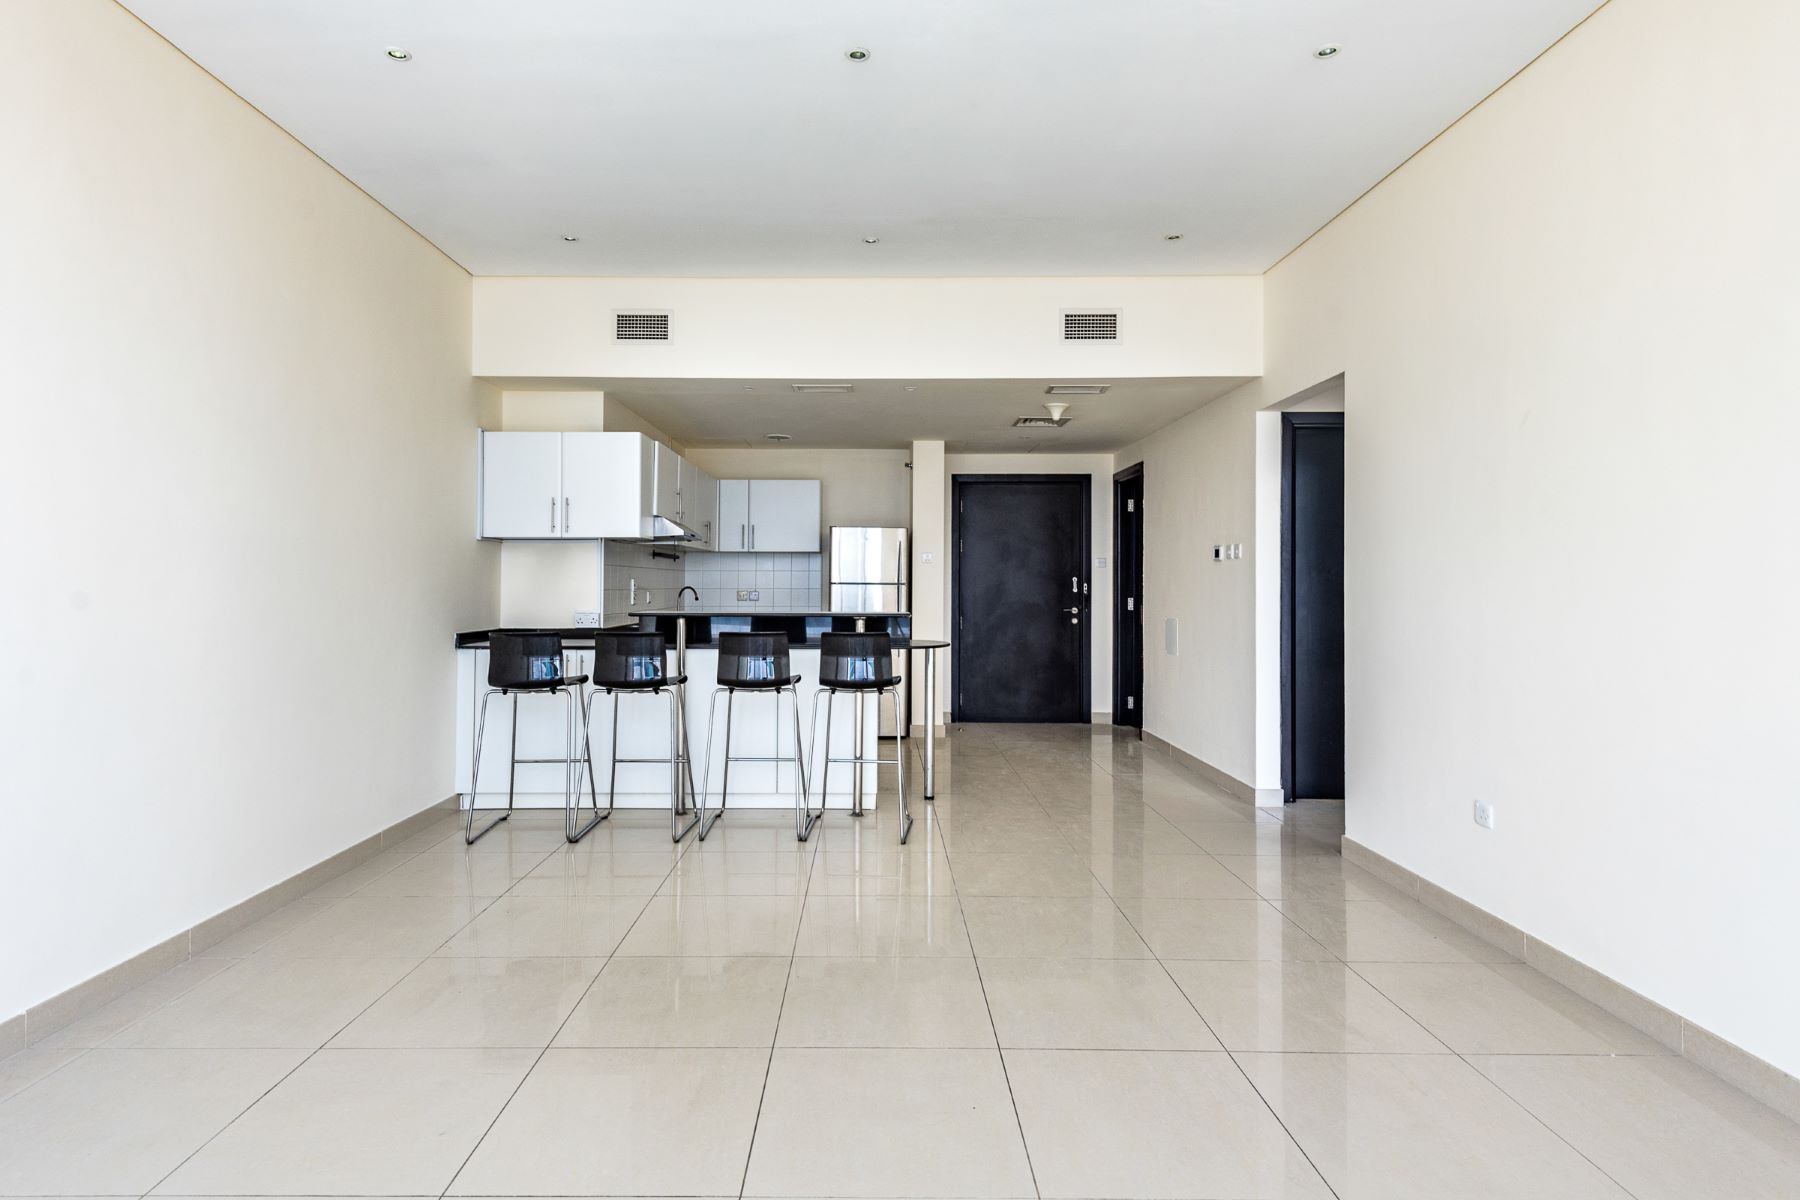 Apartments for Sale at Metro Link Vacant on Transfer Spacious Layout Dubai, Dubai United Arab Emirates